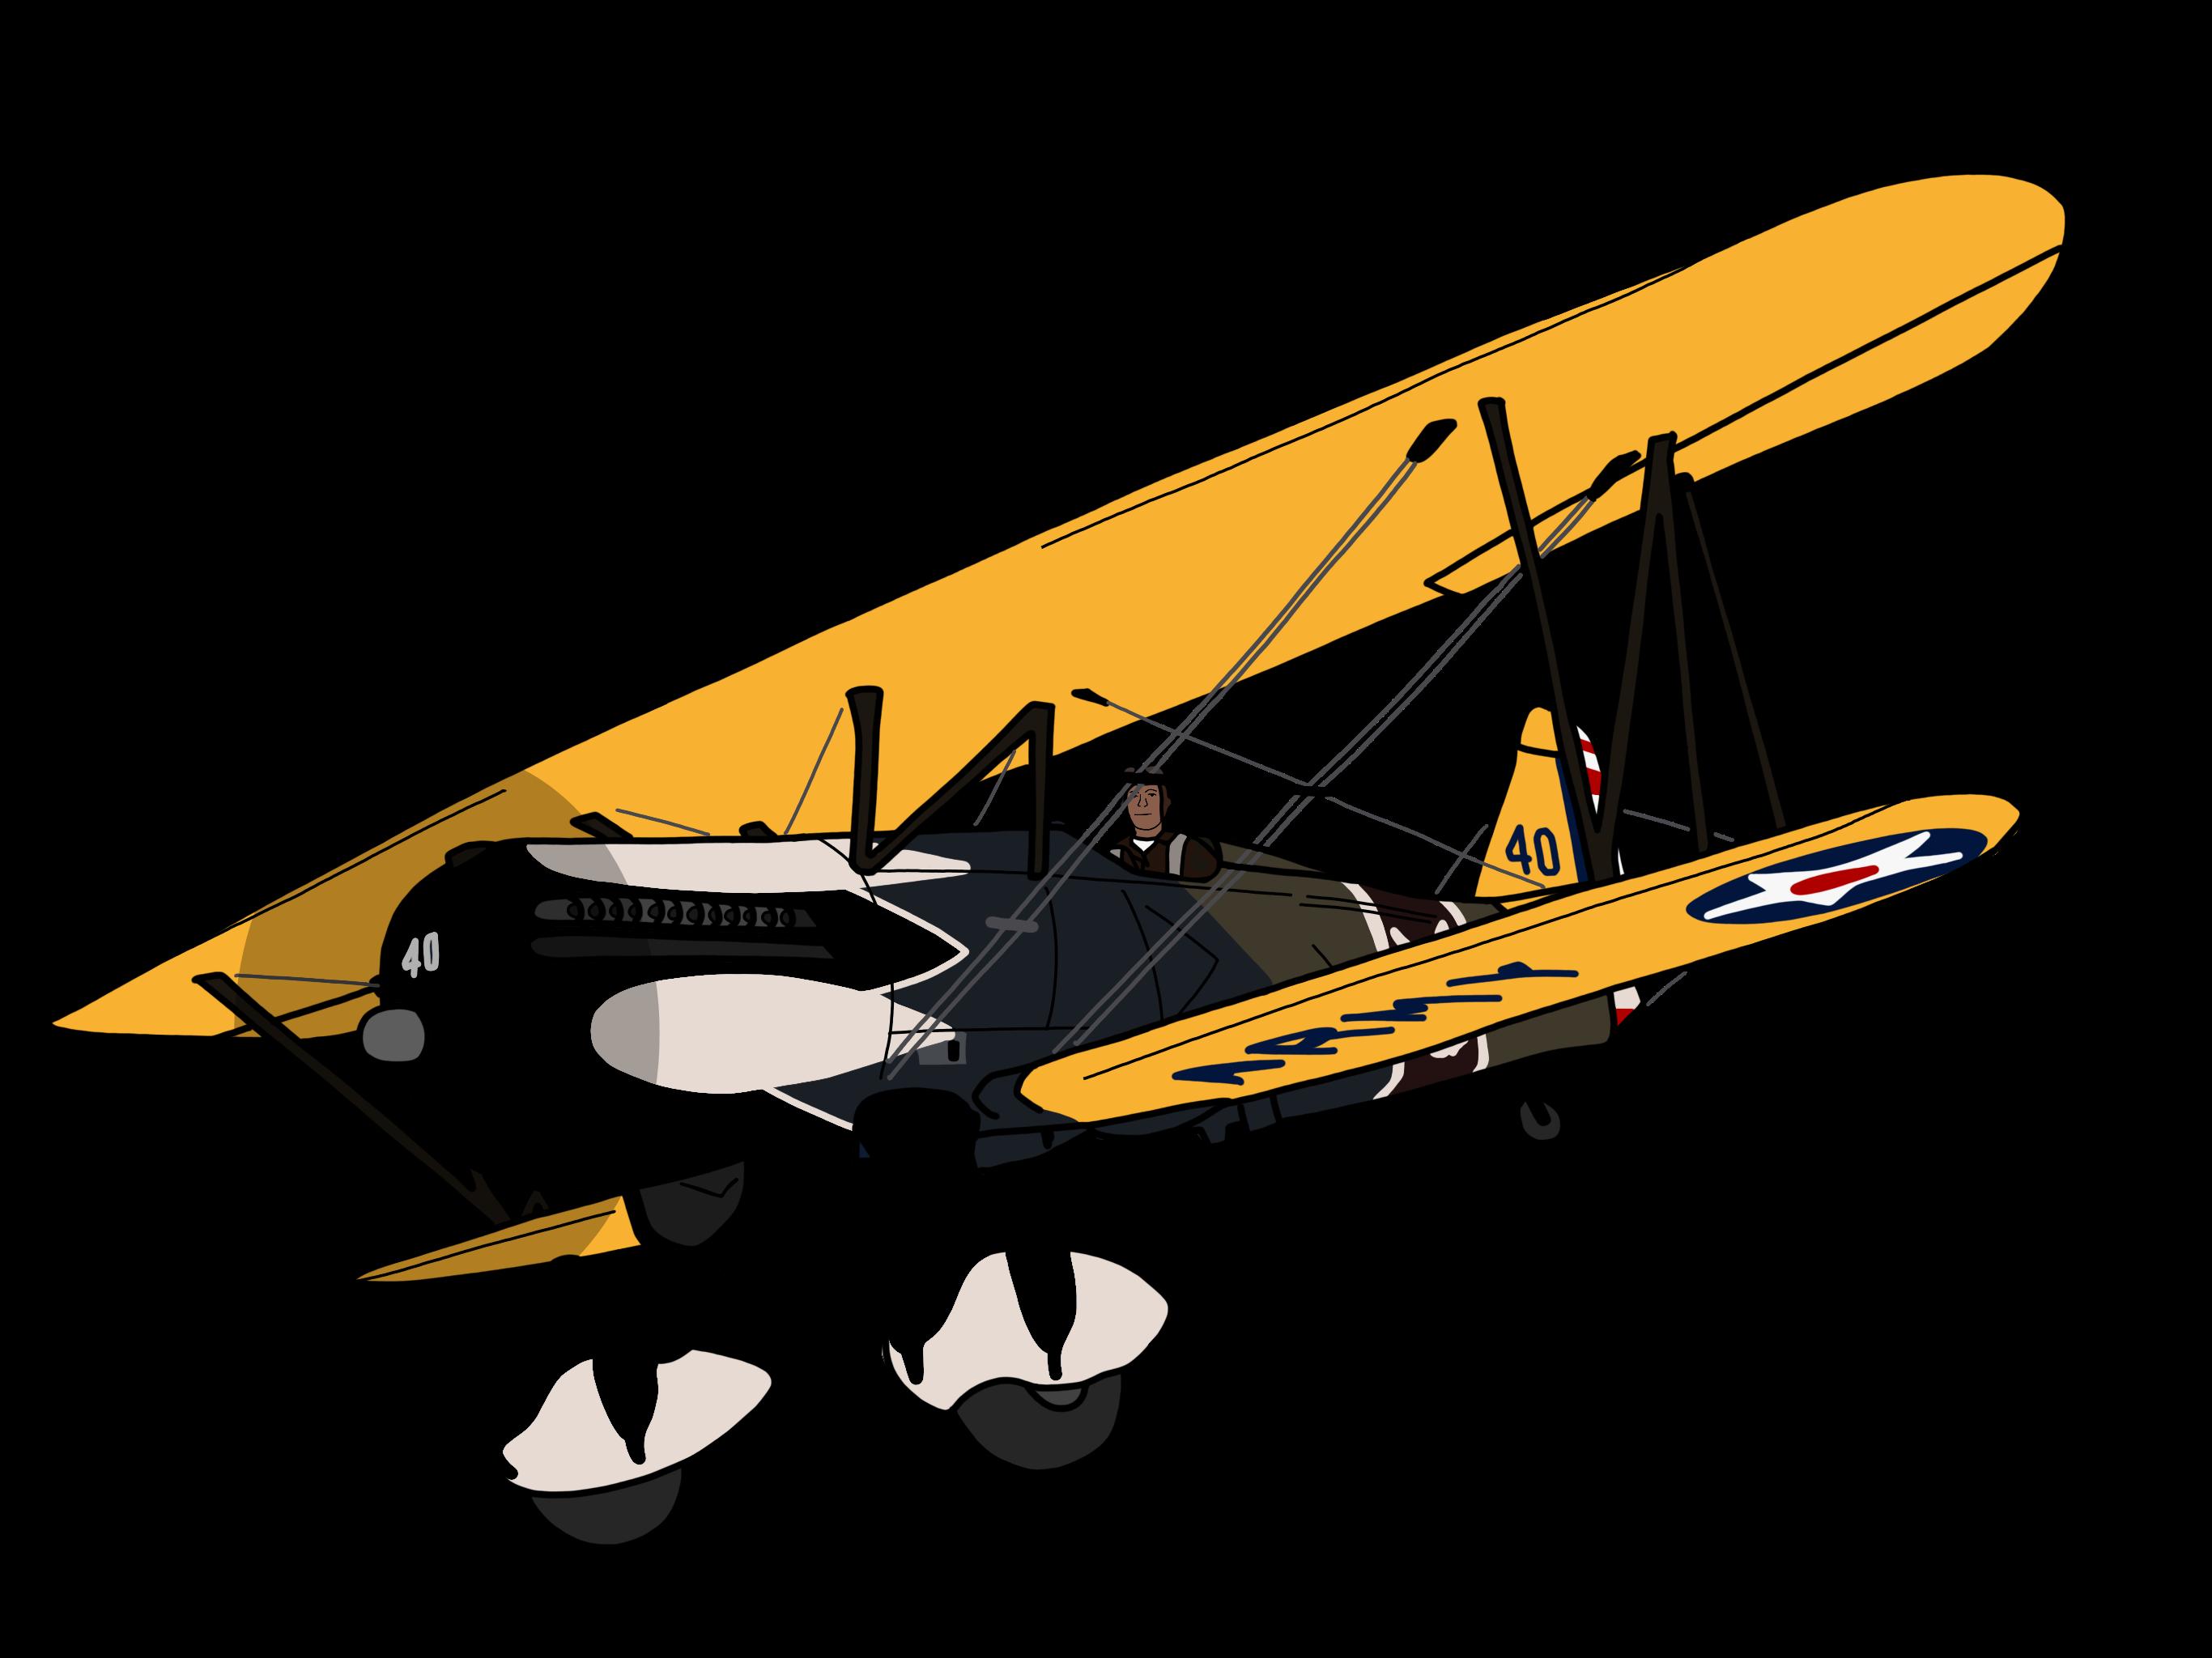 Pilot clipart pilot plane. Curtiss p e hawk